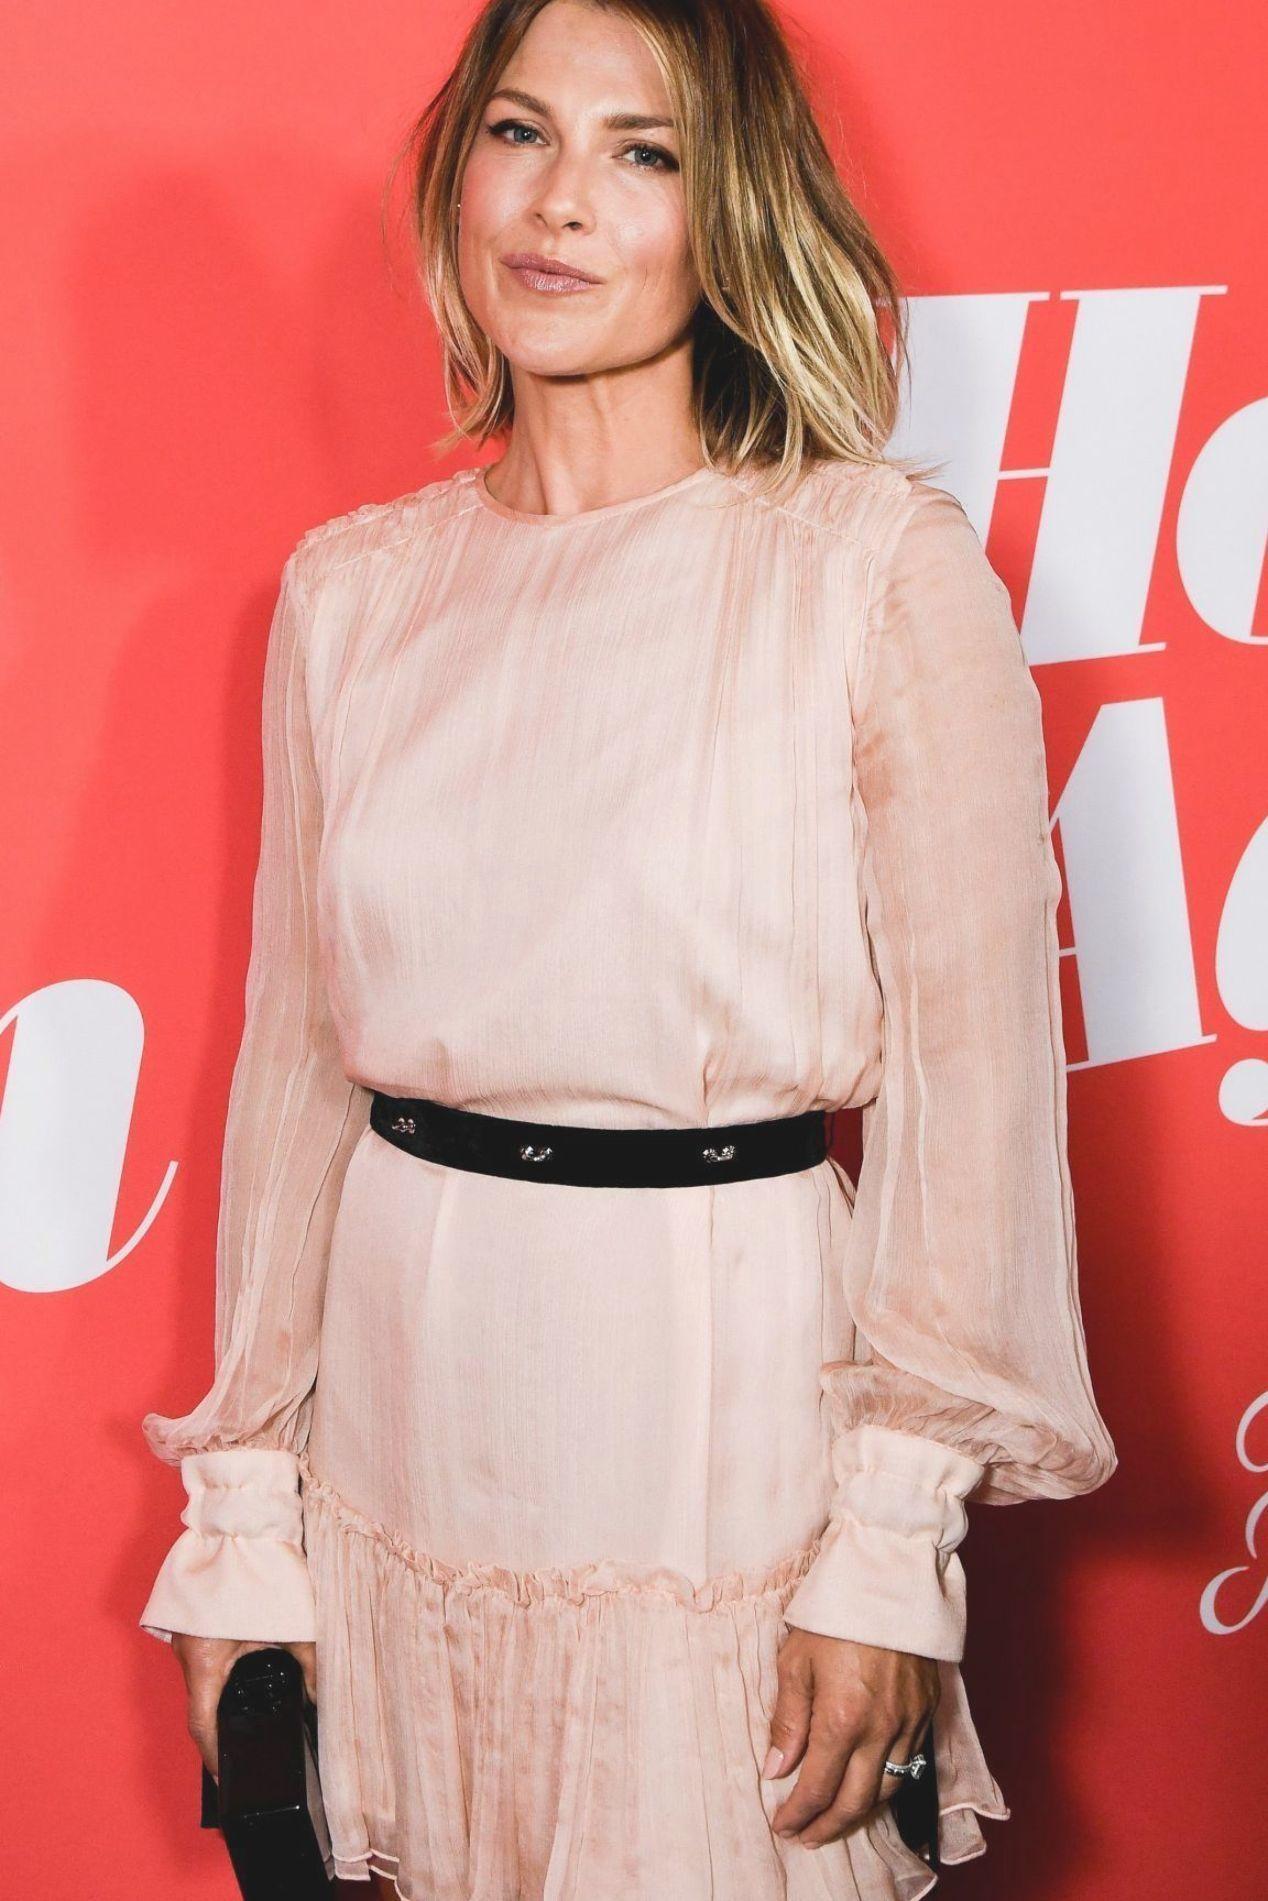 Dresses4share: Sarah Hyland Prom Dress 2012 Emmys Awards